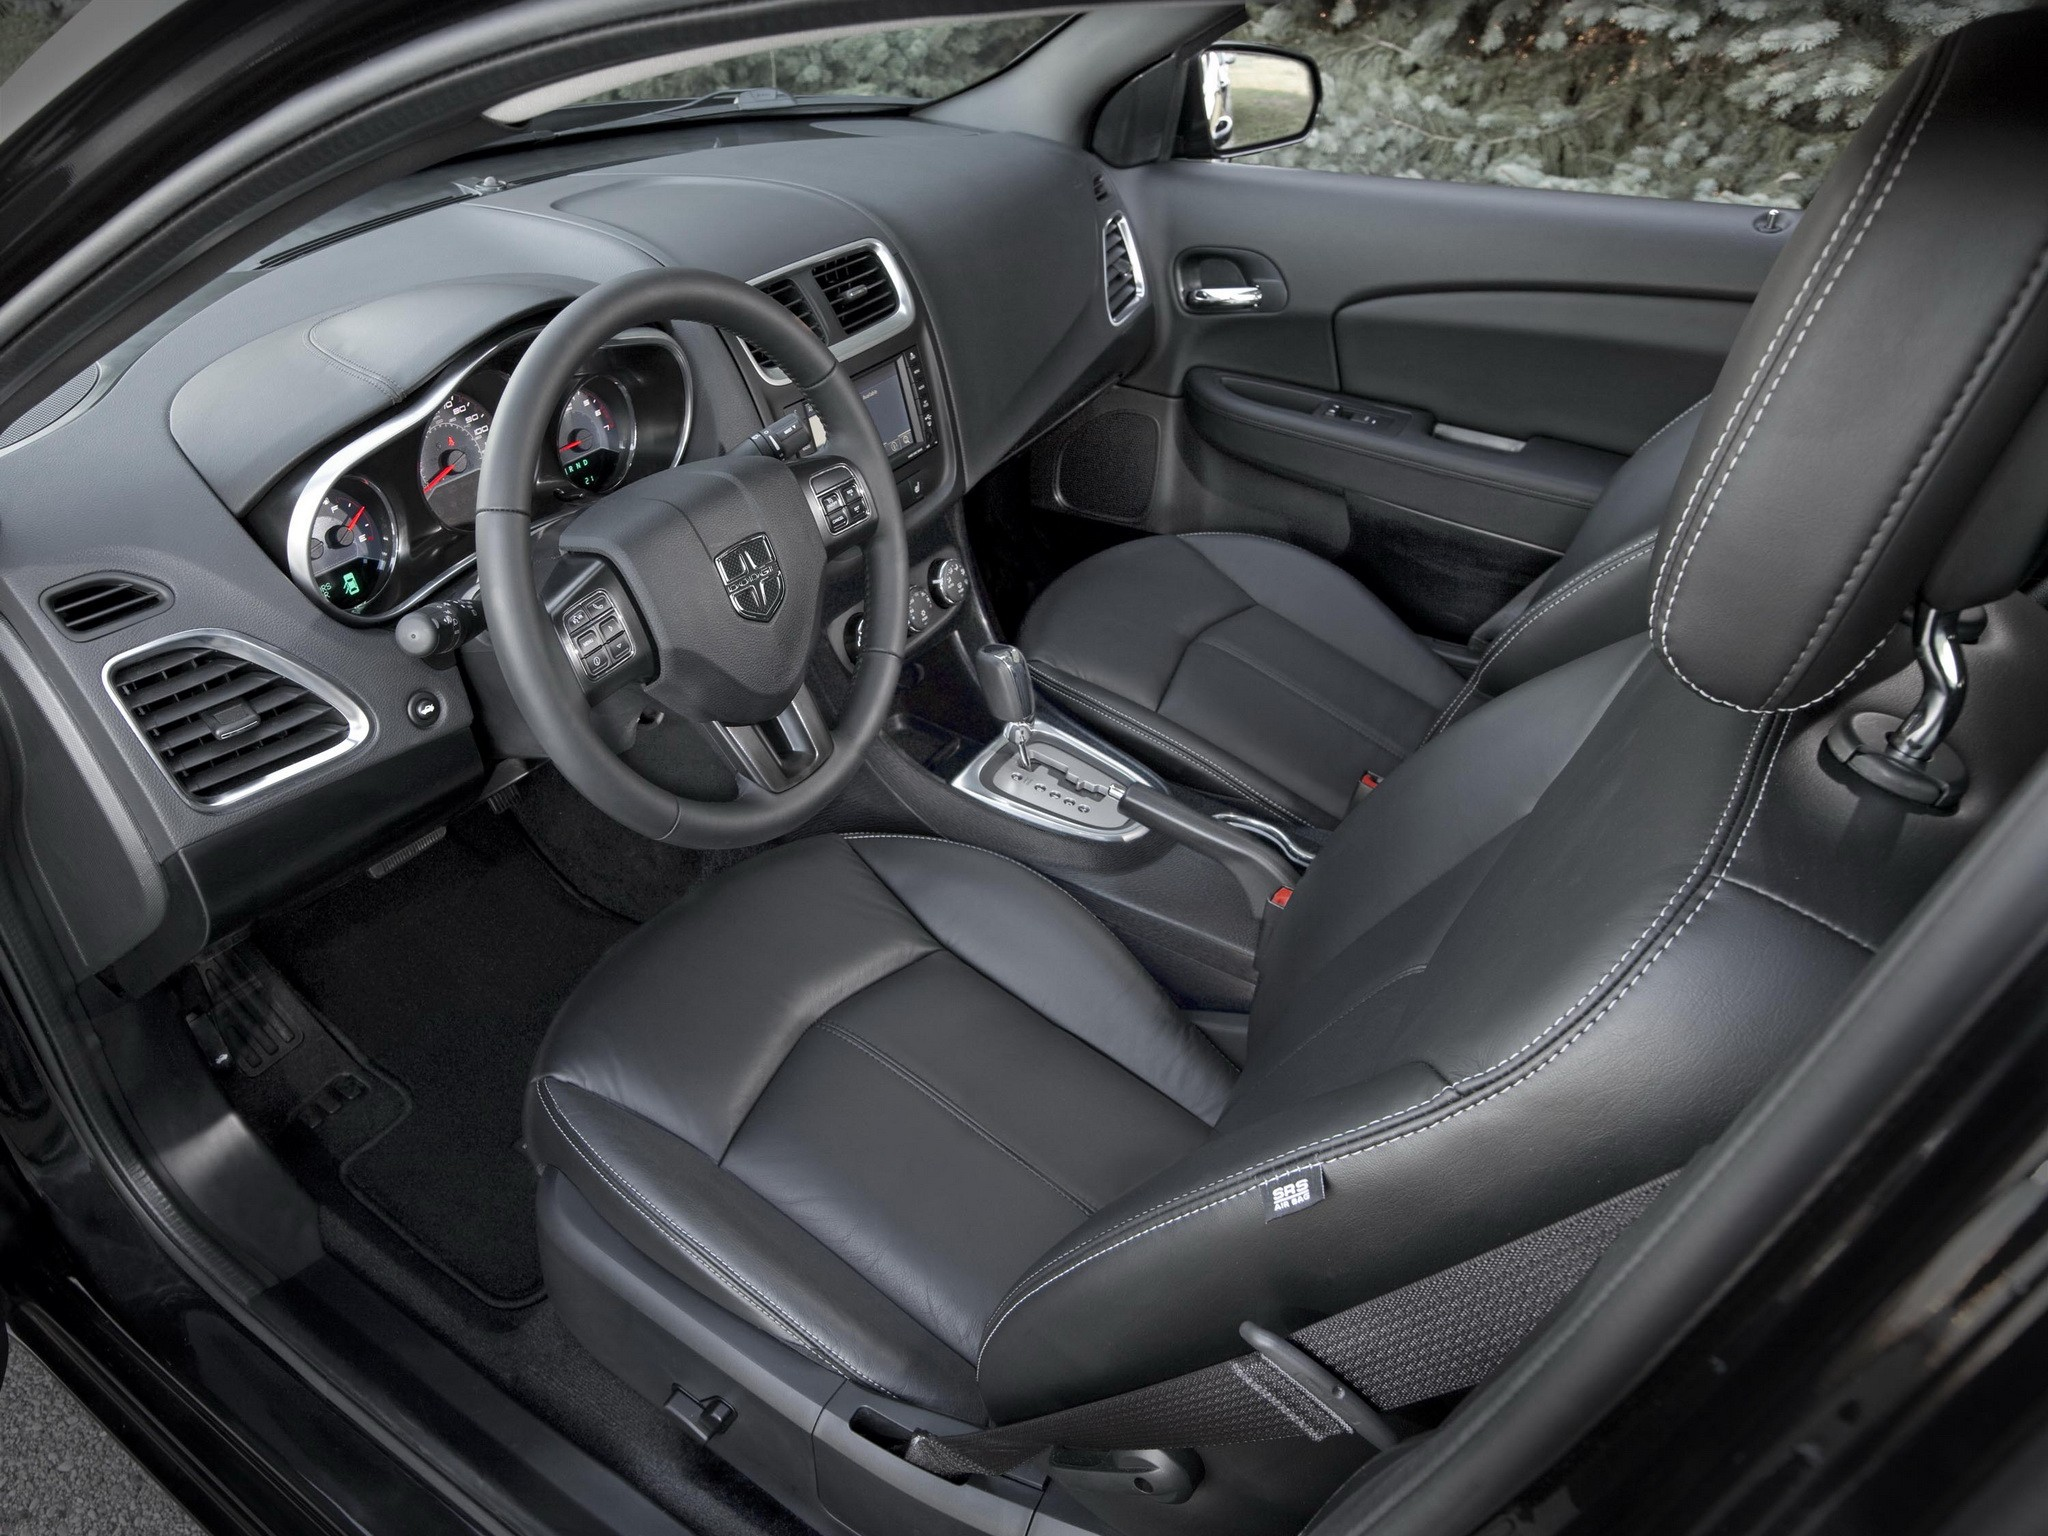 fiat chrysler automobiles will recall 1.9 million vehicles